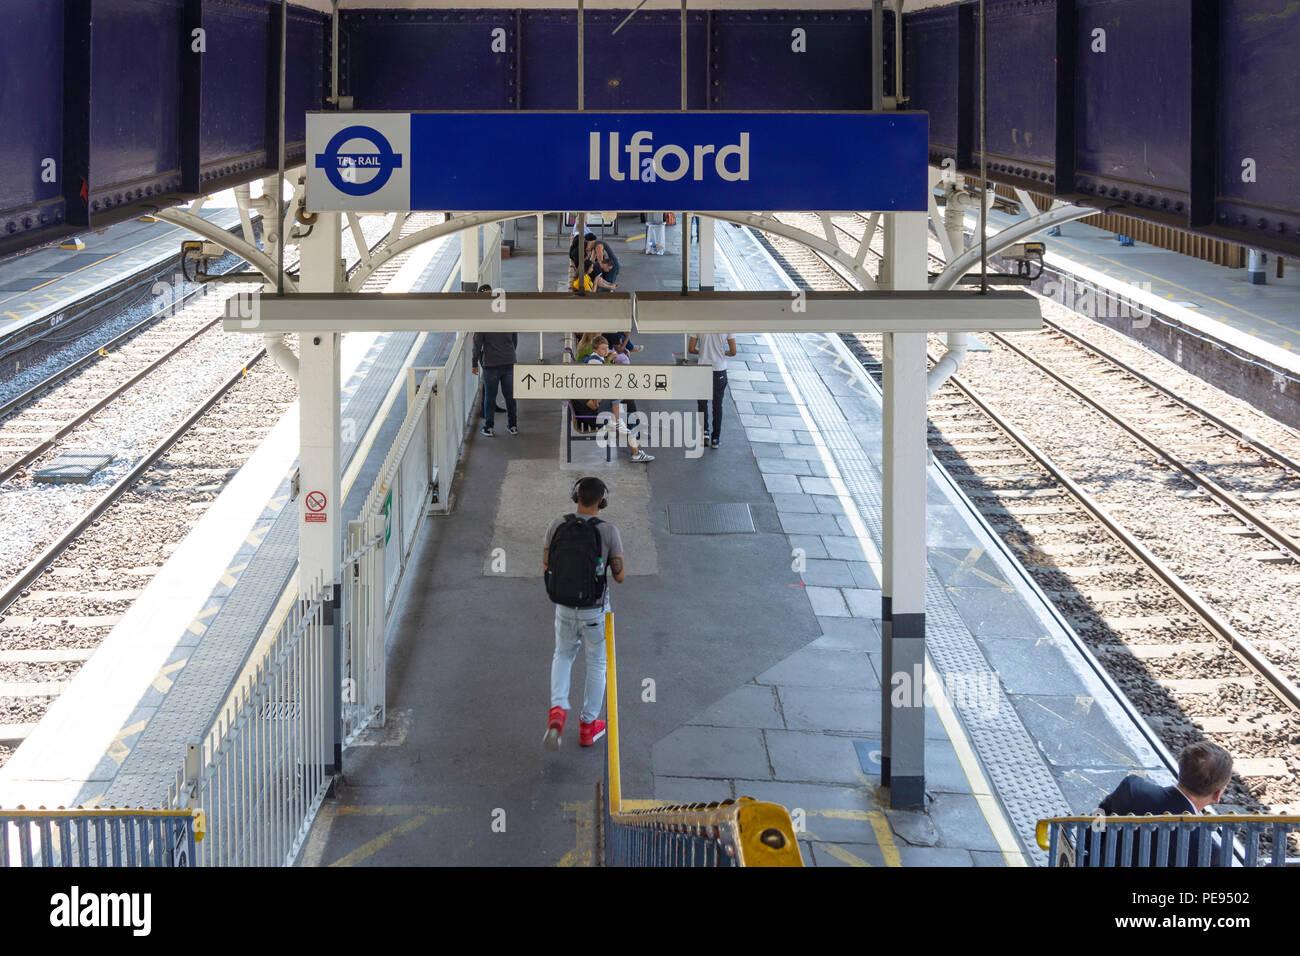 Ilford TFL Railway Station platform, Cranbrook Road, Ilford, London Borough of Redbridge, Greater London, England, United Kingdom - Stock Image